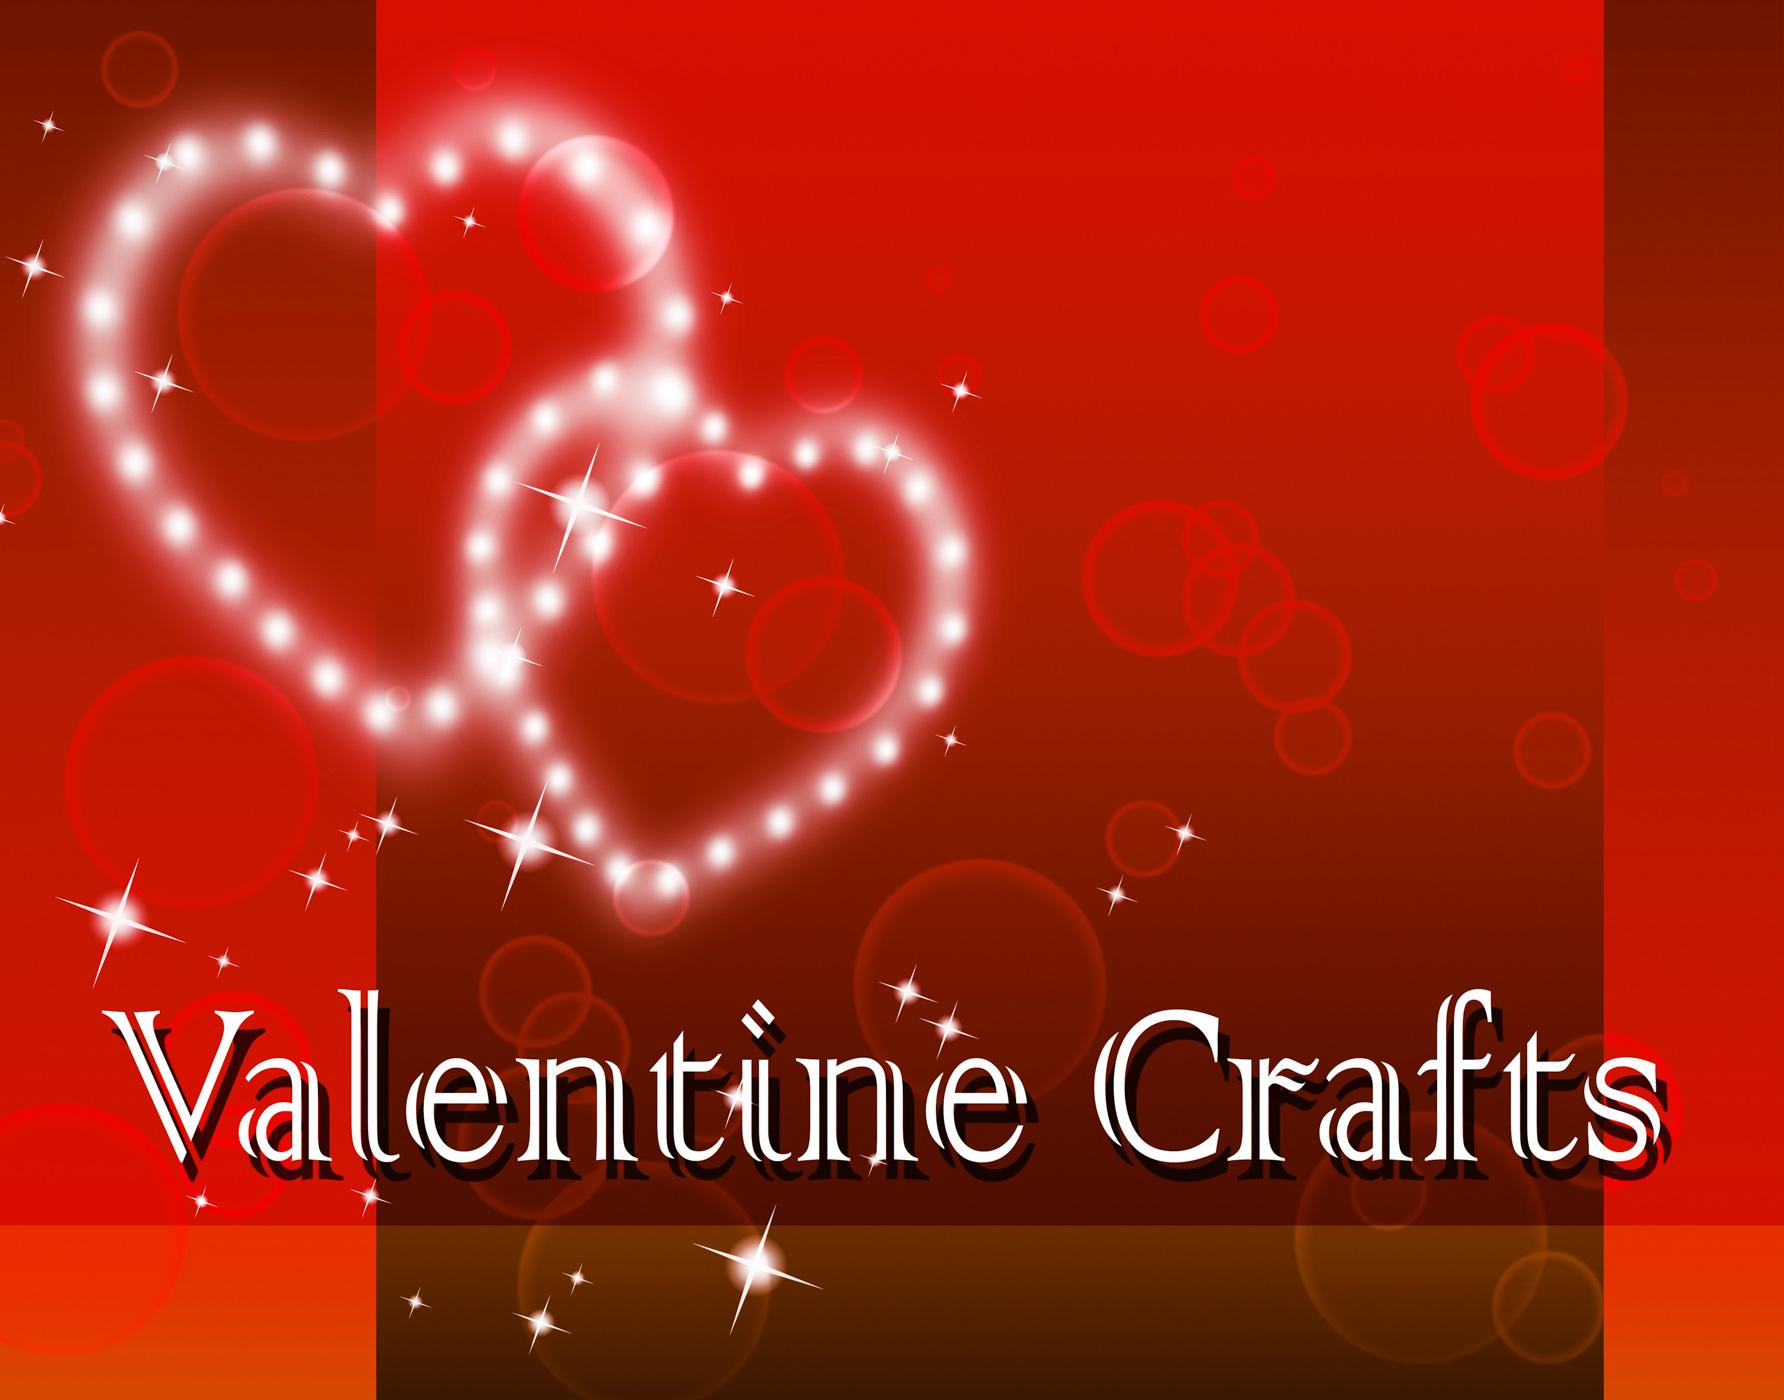 Valentine crafts represents valentines day and art photo